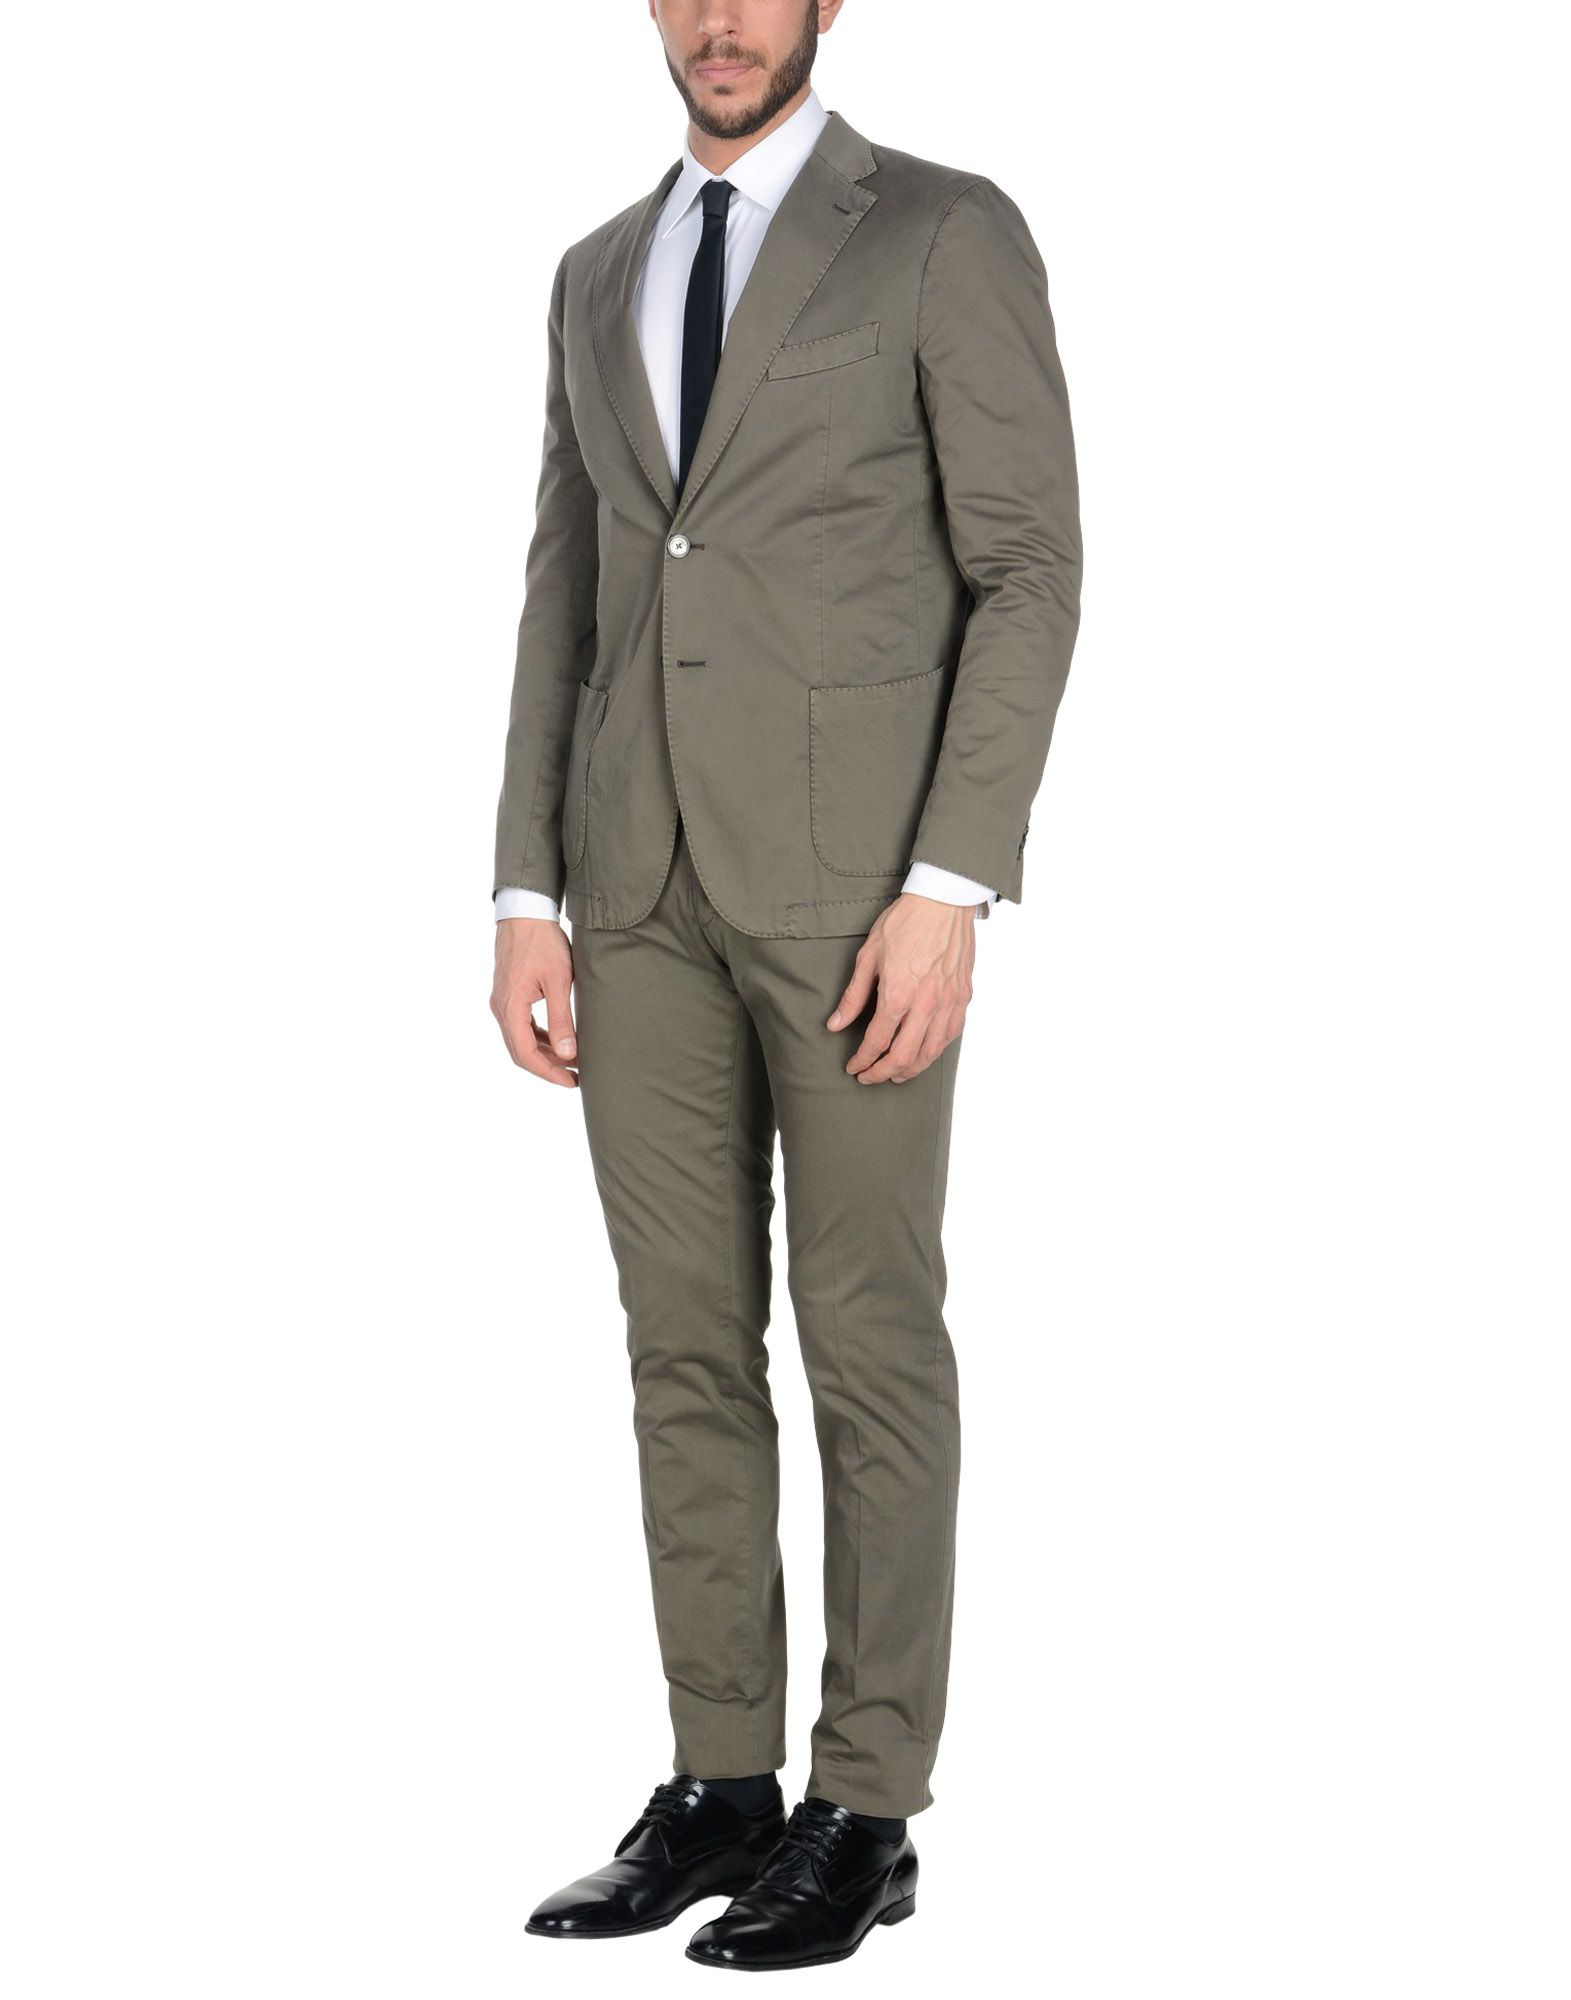 Abito Panama Jacket Donna - Acquista online su